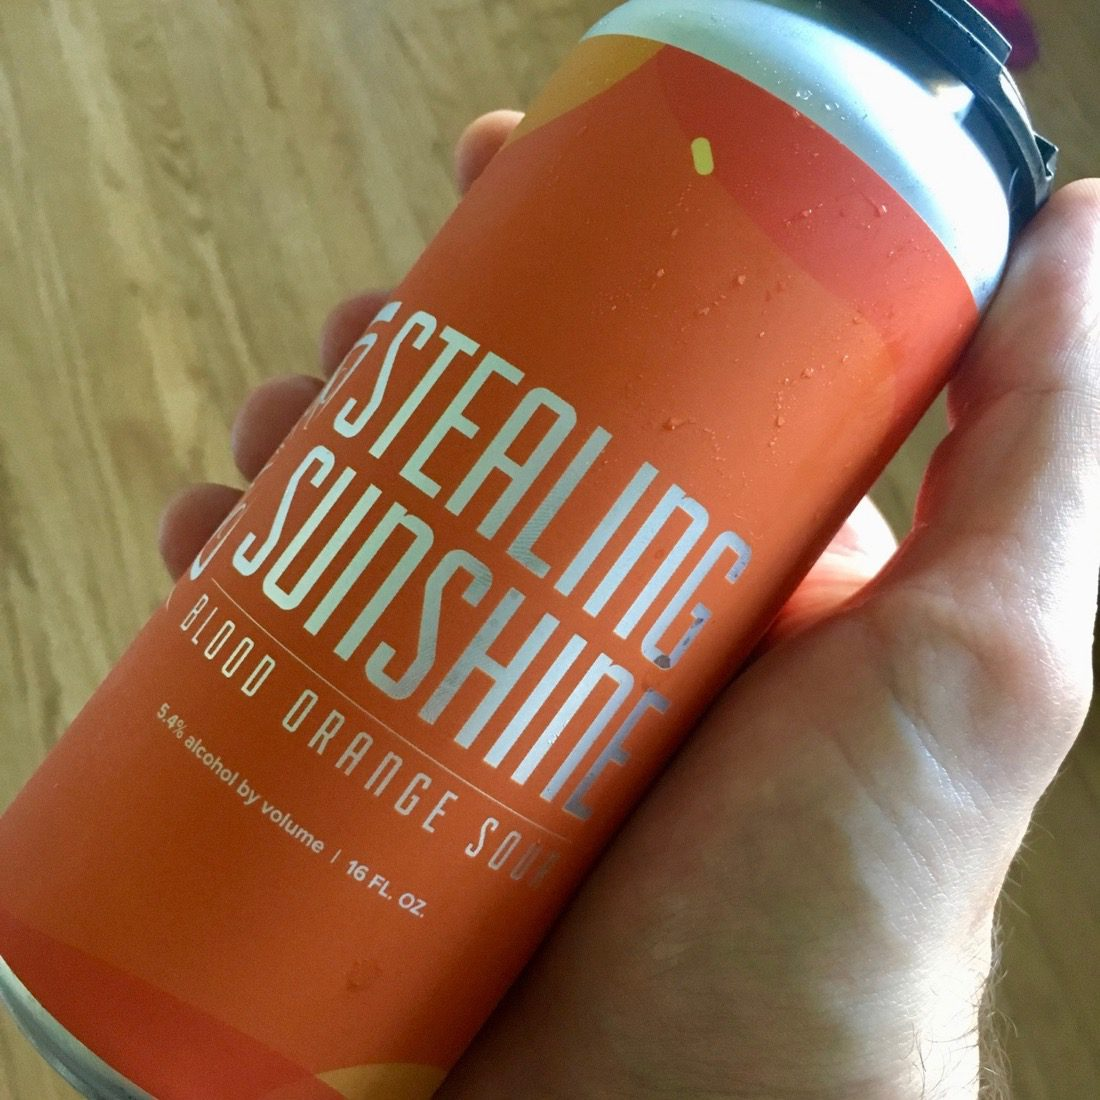 Afternoon Beer Break: Black Horizon Stealing Sunshine